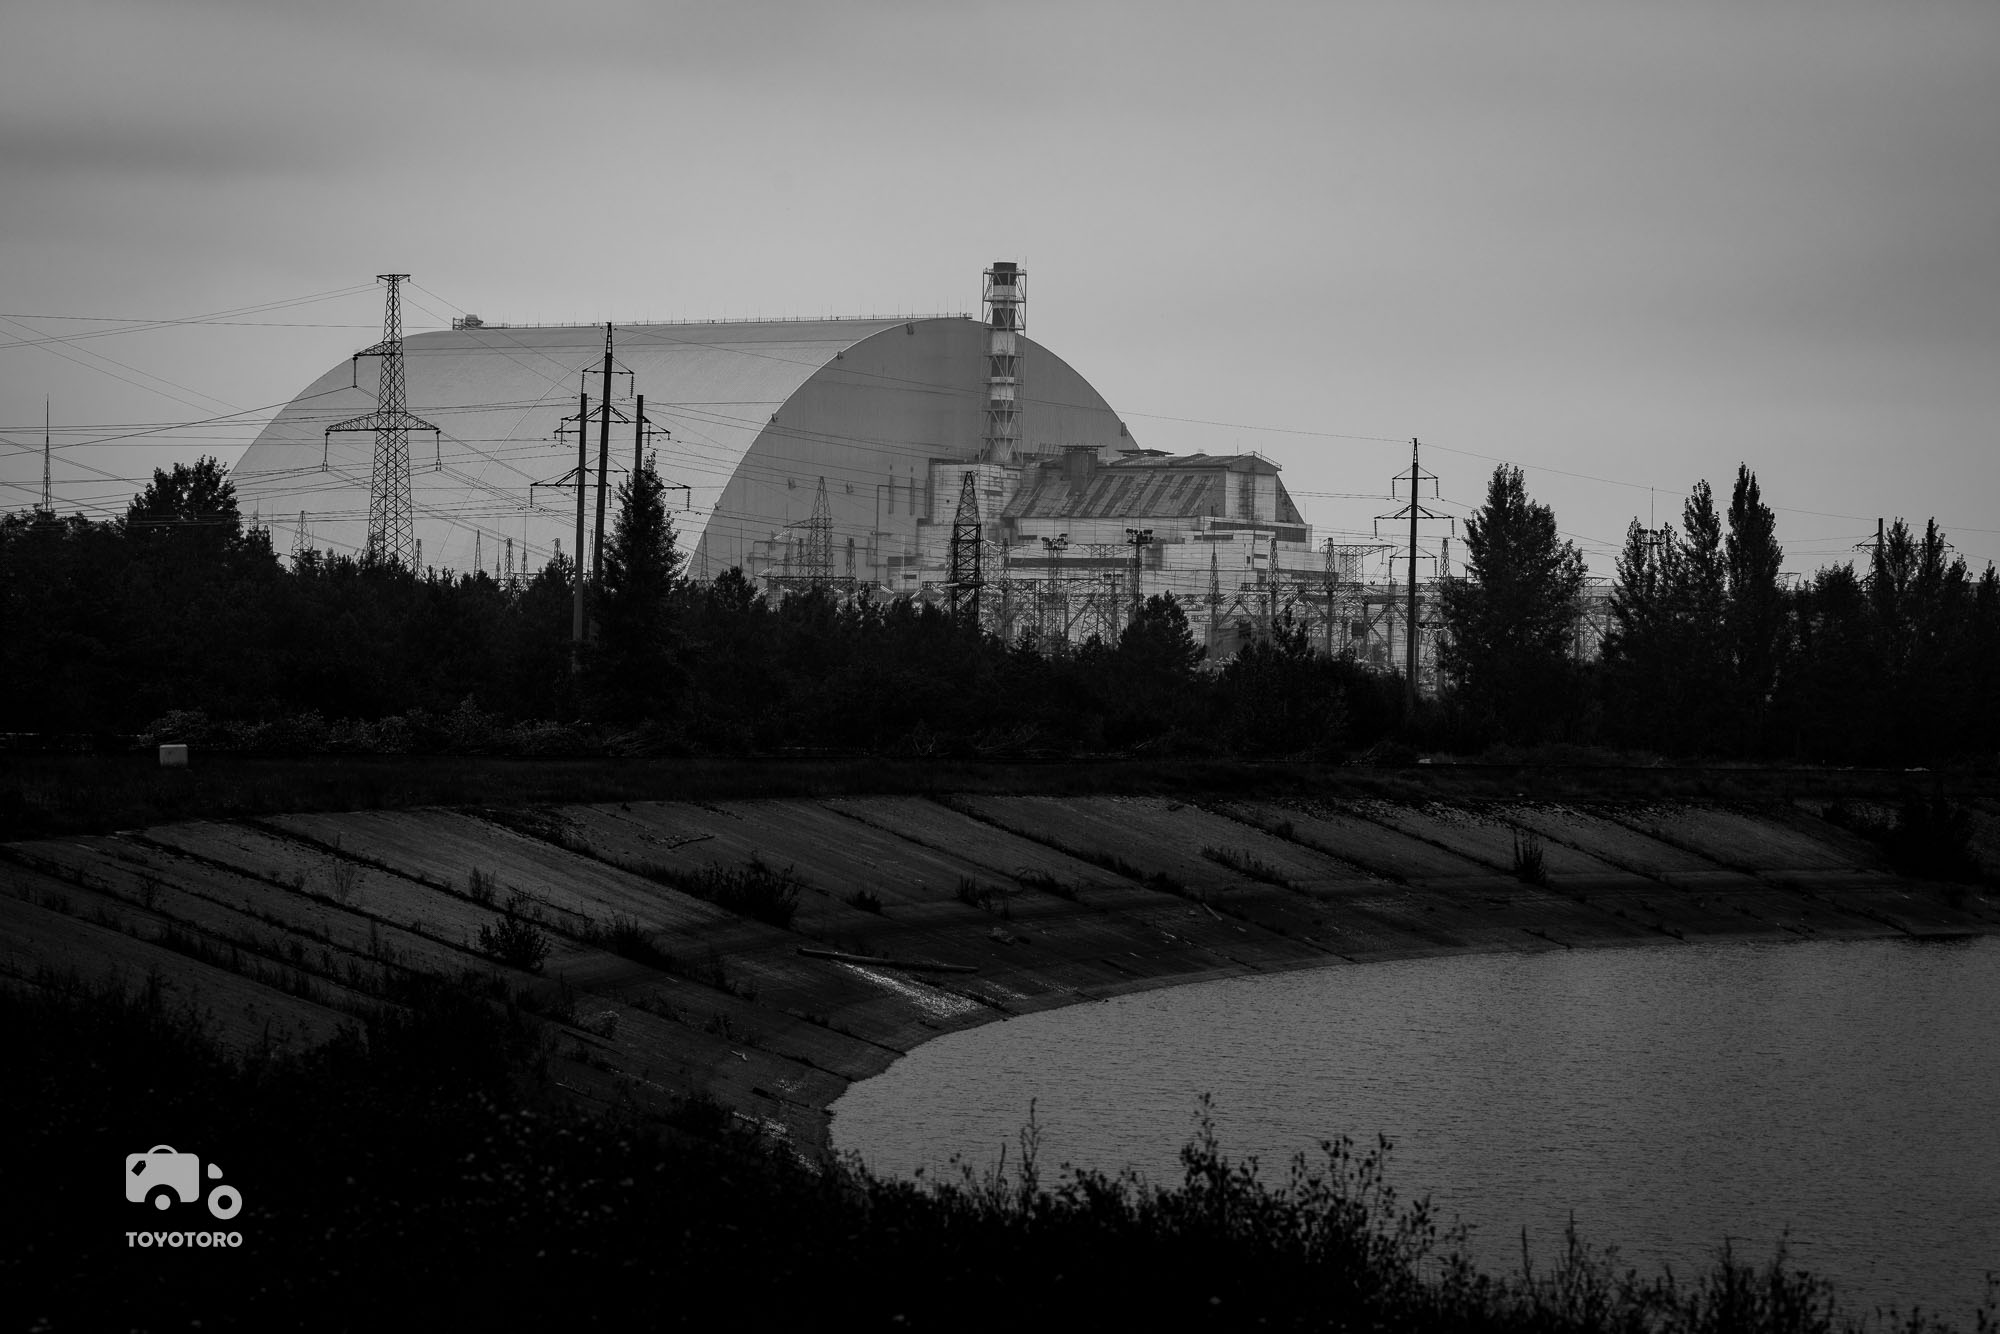 Chernobyl Nuclear Power Plant sarcophagus